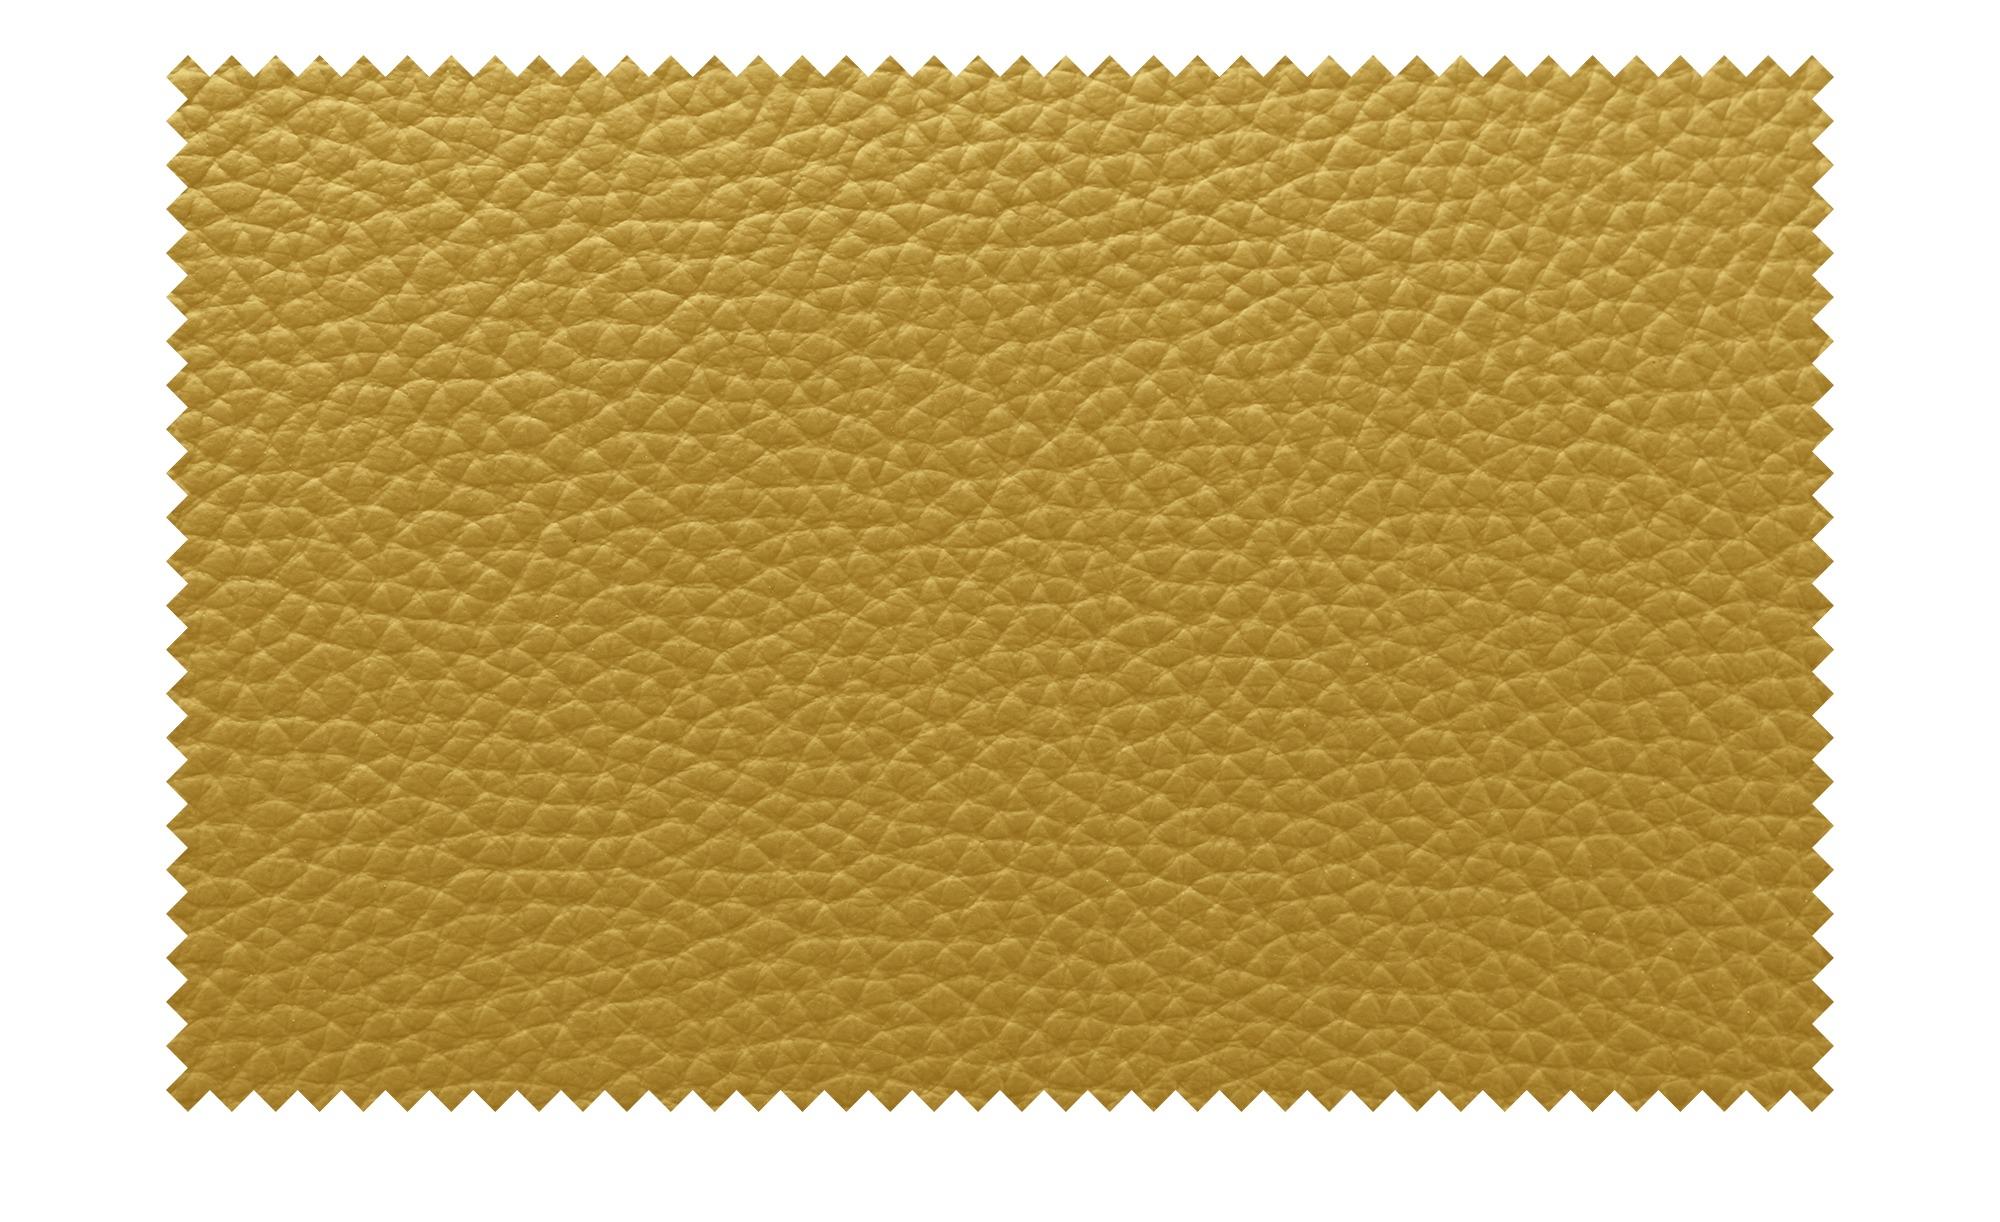 Nils Olsen Relaxsessel  Svenstrup ¦ gelb ¦ Maße (cm): B: 76 H: 108 T: 81 Polstermöbel > Sessel > Ledersessel - Höffner